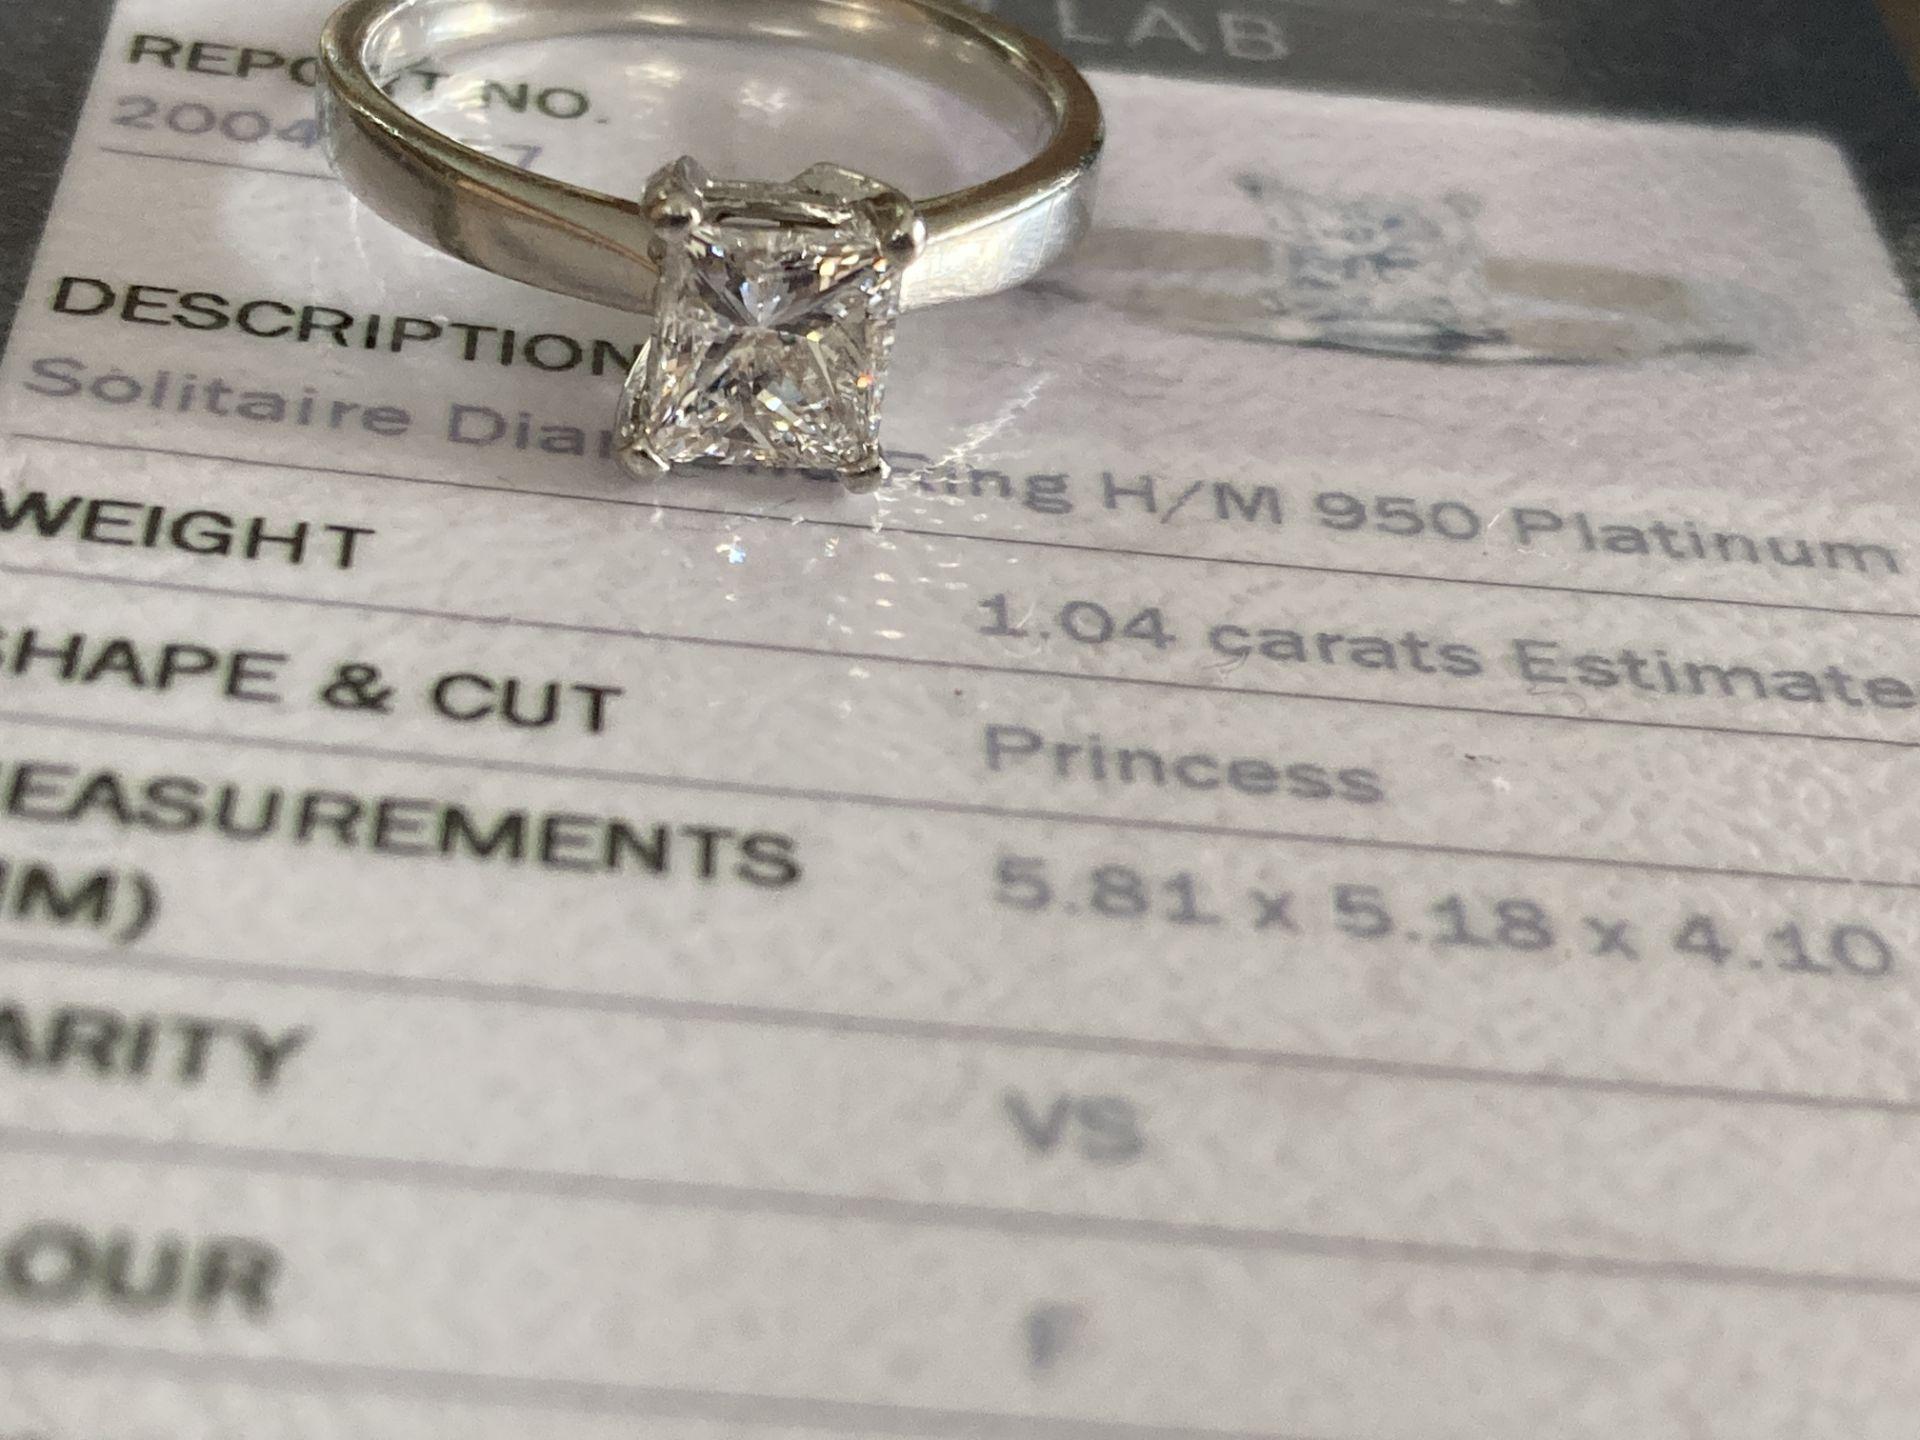 1.04CT (VS/F) PLATINUM PRINCESS CUT DIAMOND SOLITAIRE RING (CERTIFICATED) - Image 4 of 10